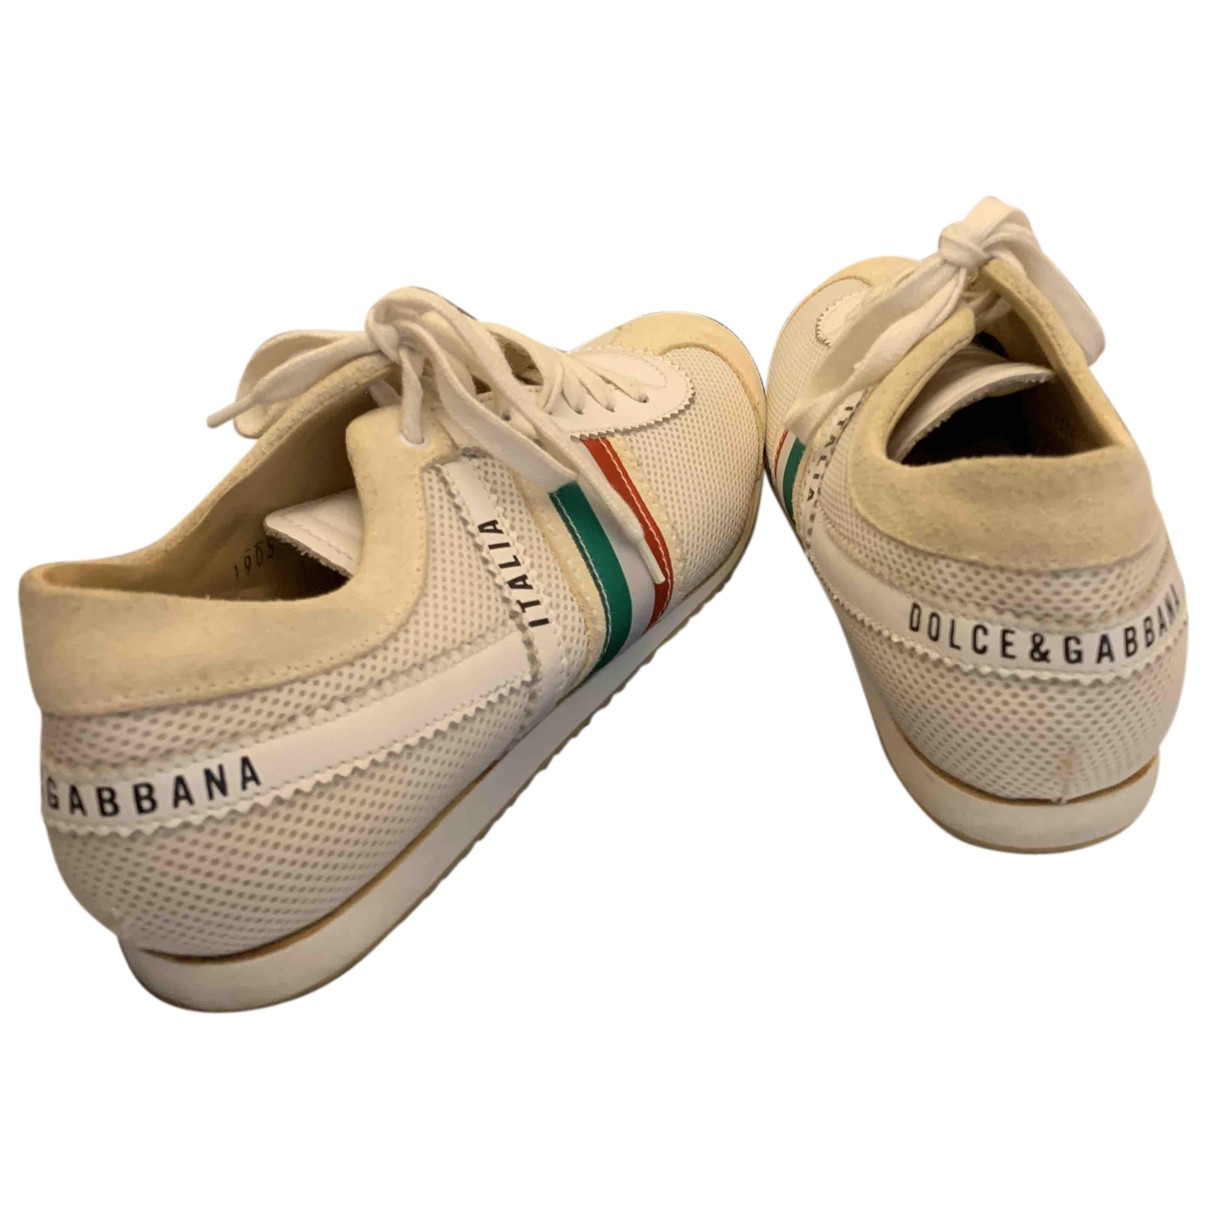 Dolce & Gabbana - Baskets   pour femme en suede - beige